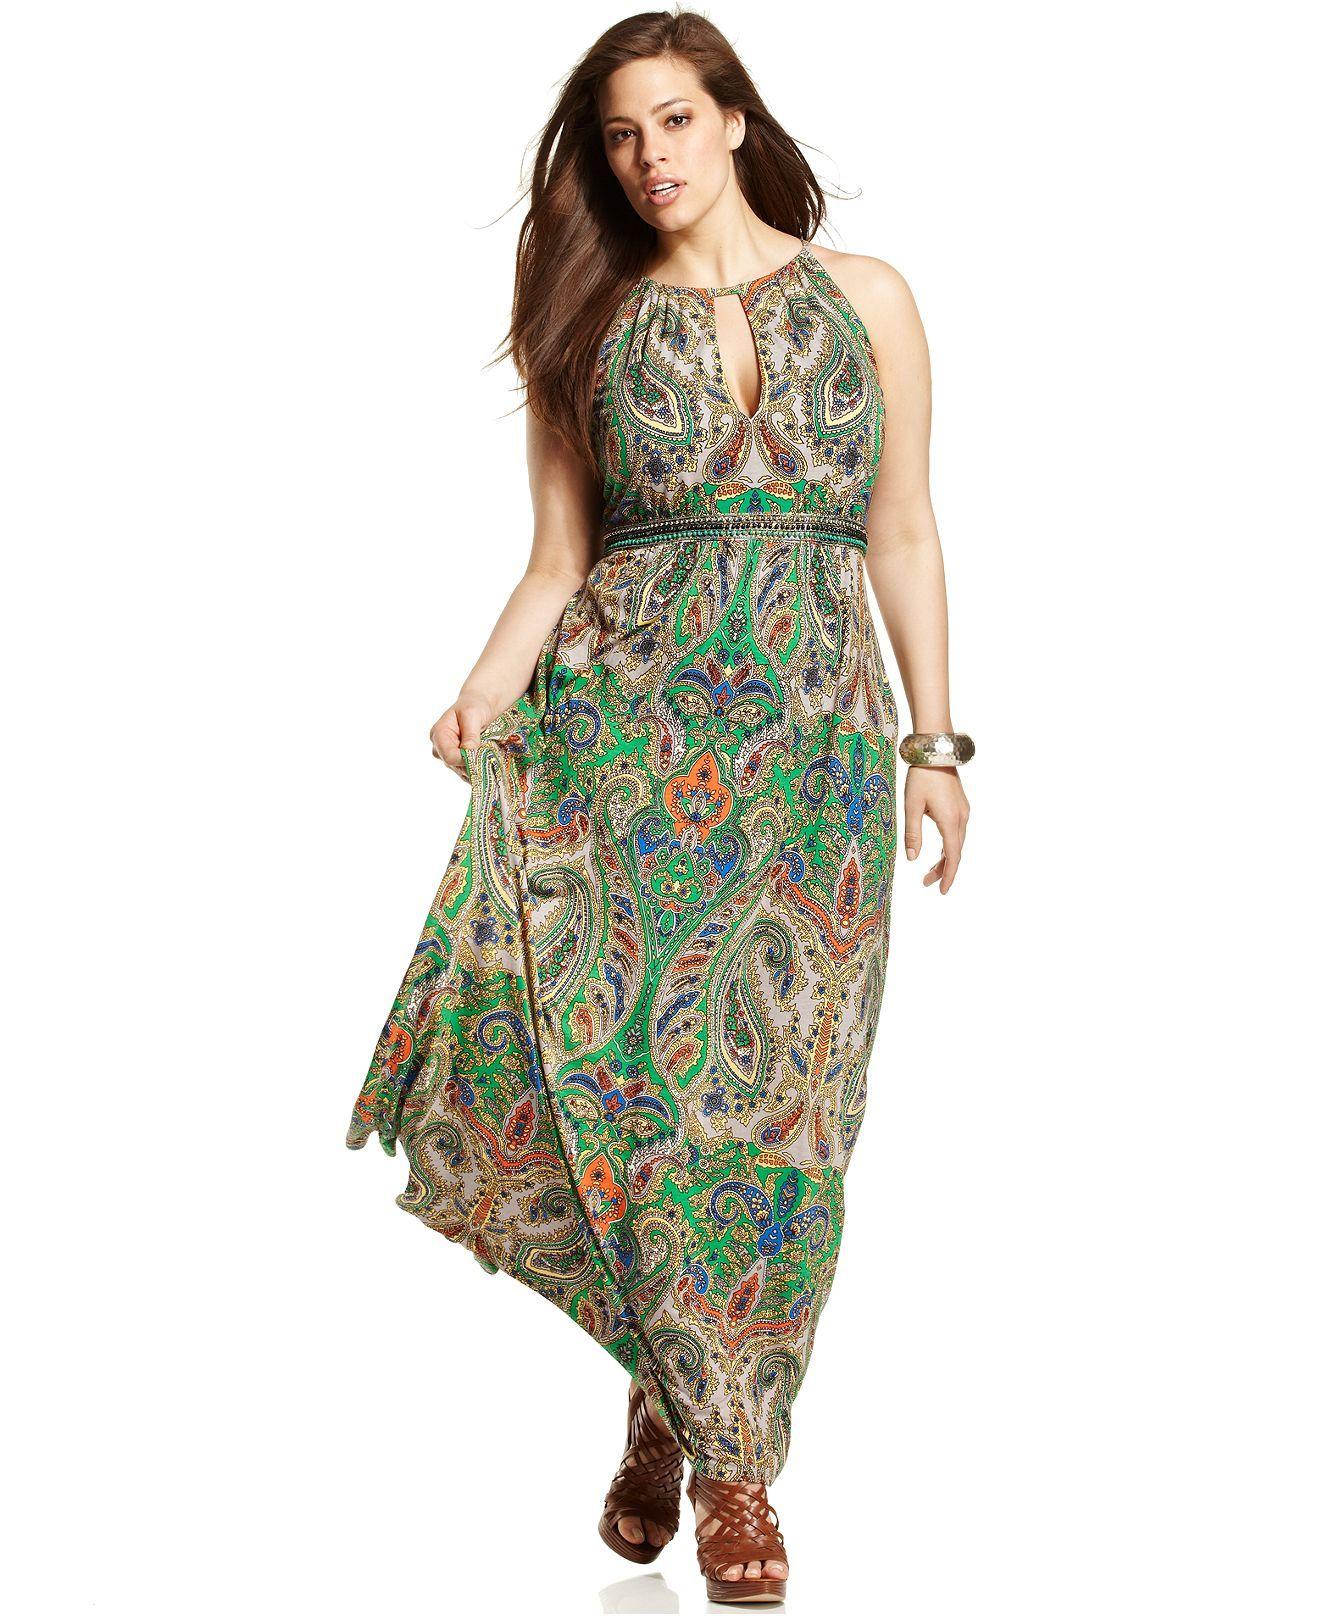 96ce426ebf5 INC International Concepts Plus Size Dress